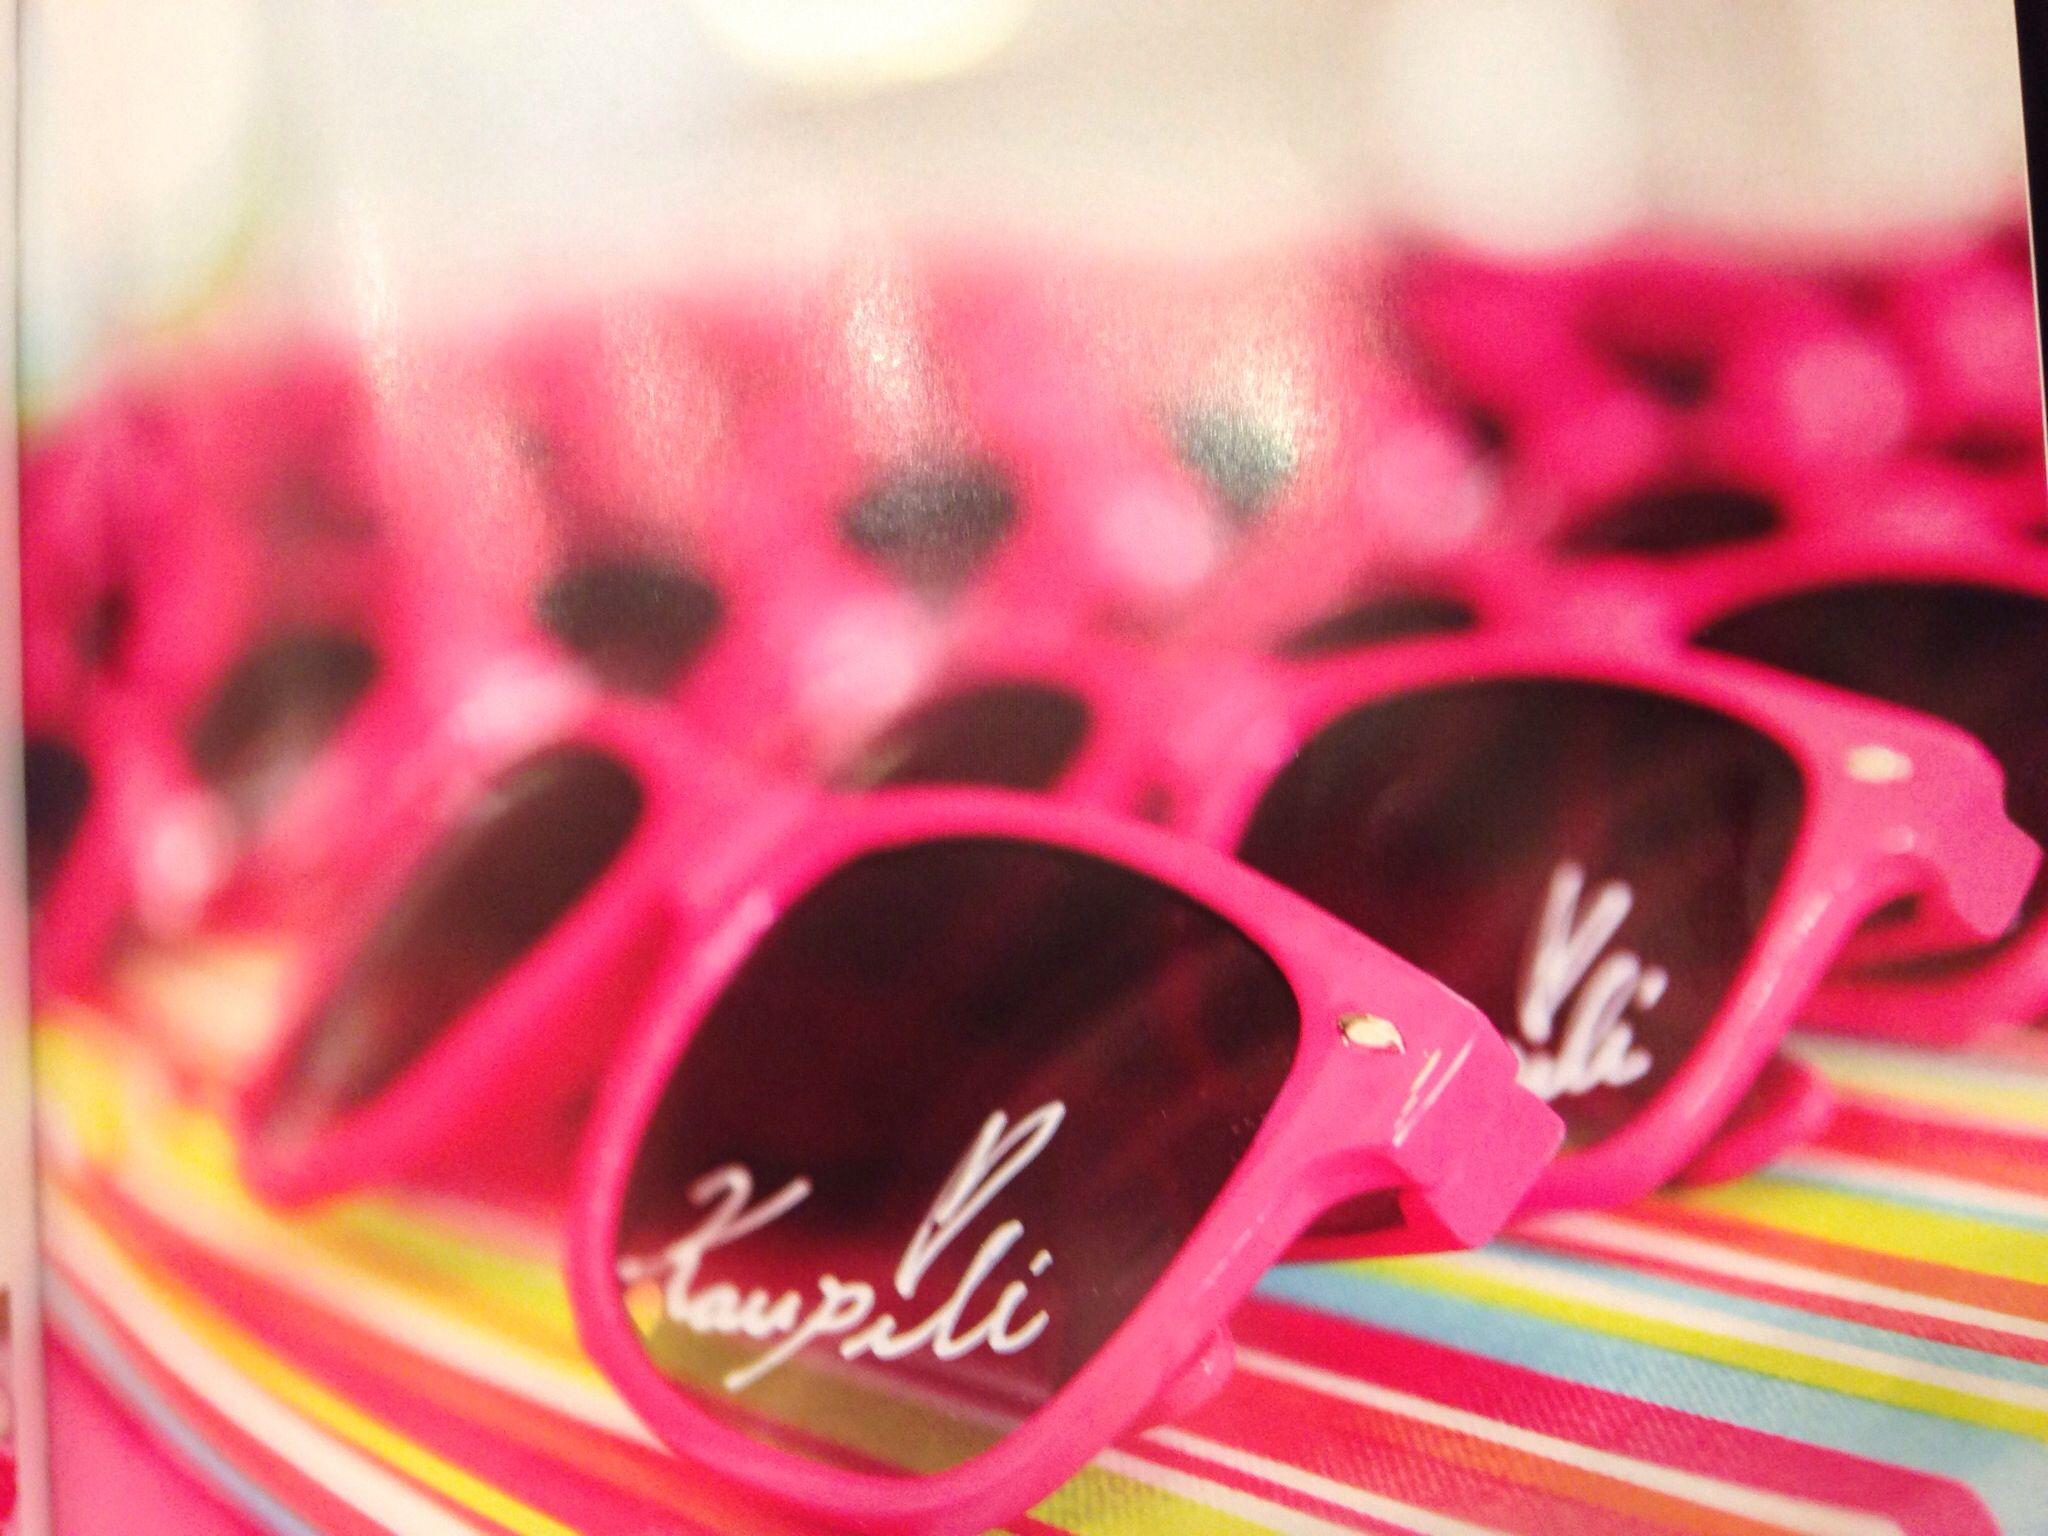 sunglasses | Wedding ideas | Pinterest | Wedding and Weddings